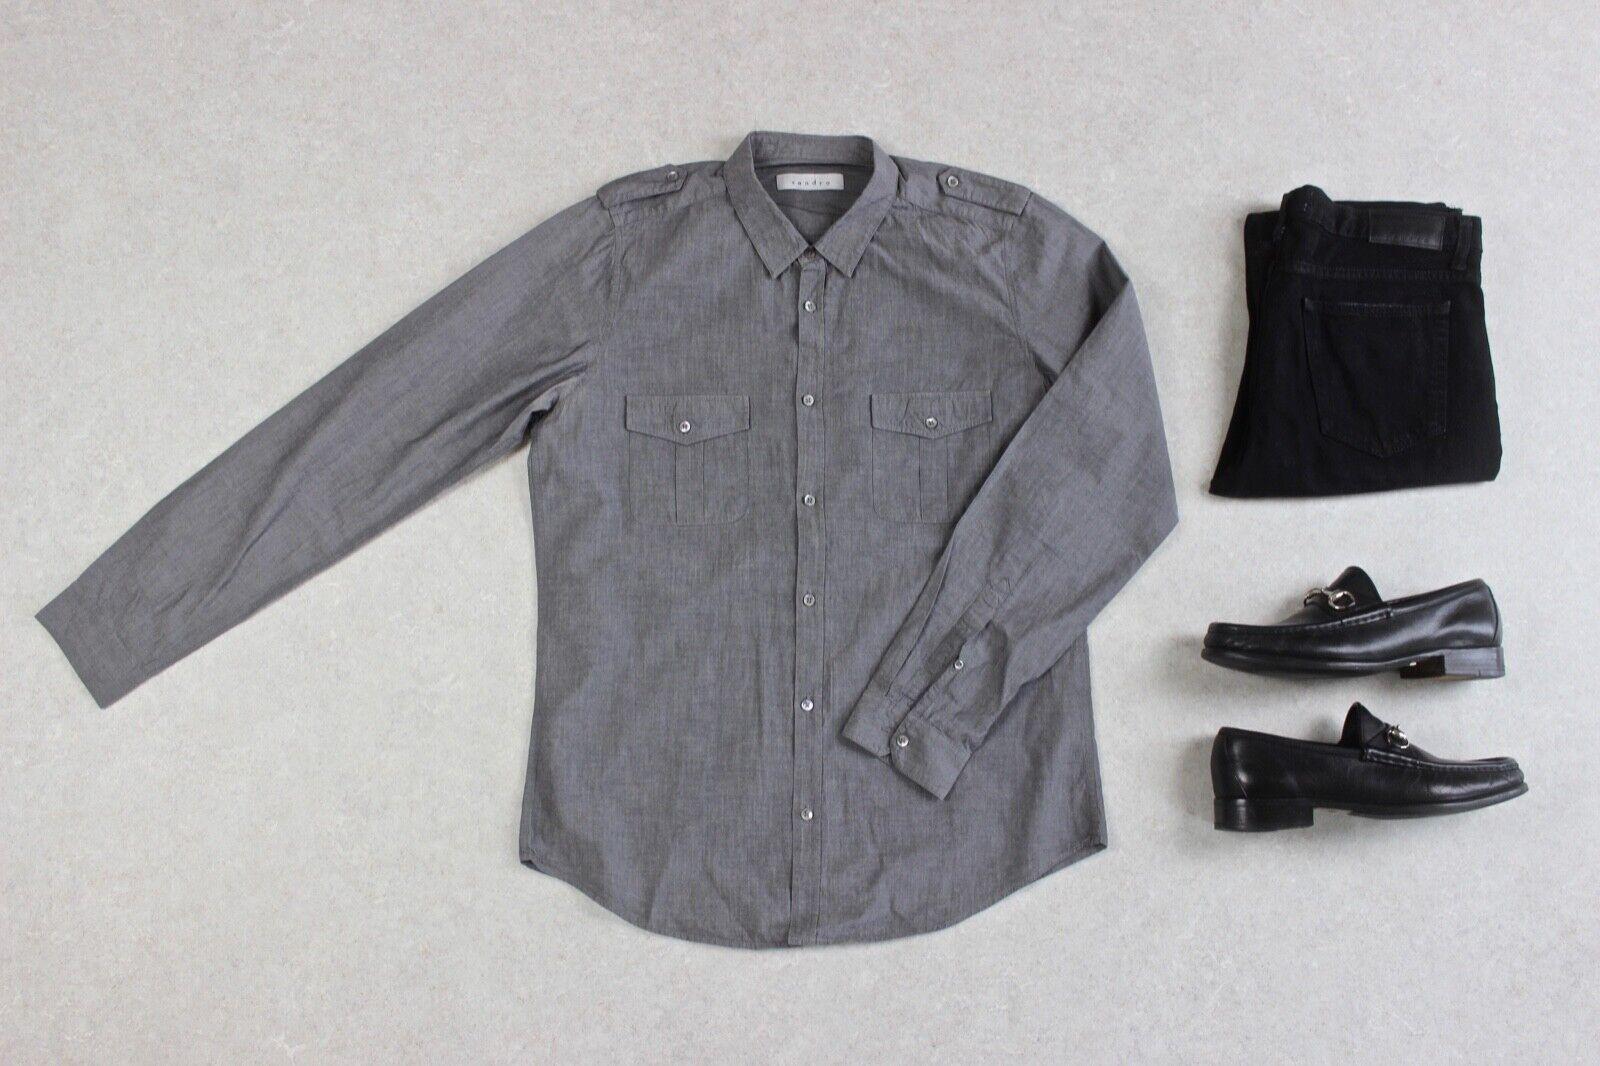 a50ac6c3686 Sandro - Shirt - Grey - Large ncrkna166-Casual Button-Down Shirts ...